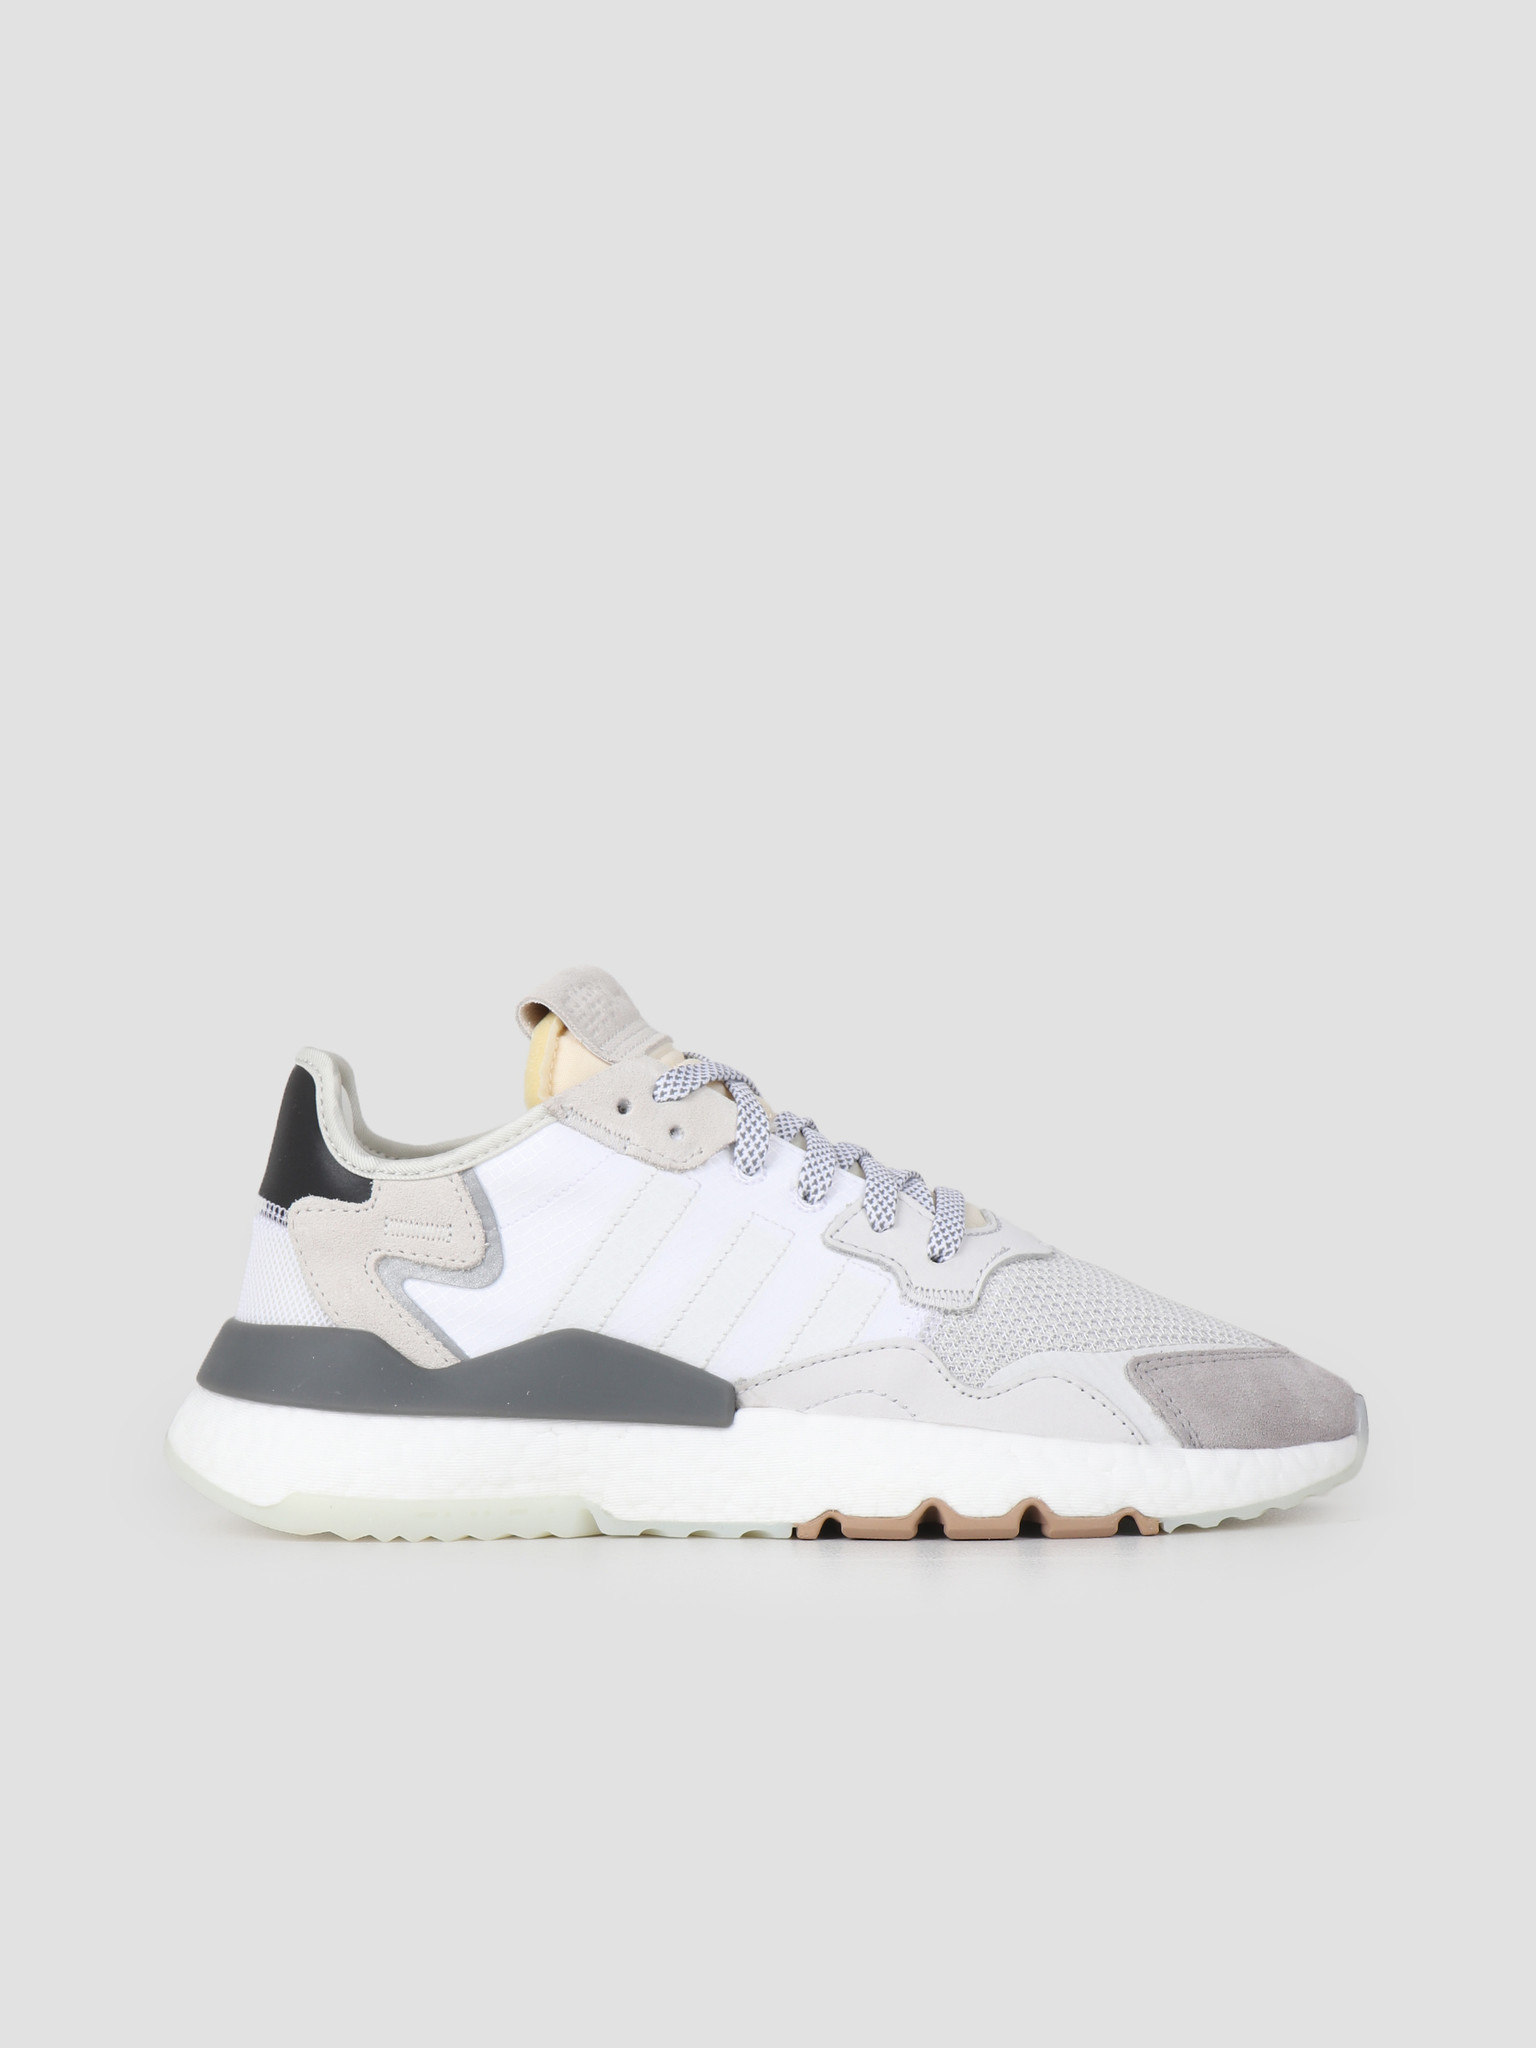 adidas Nite Jogger Ftwwht Crywht Cblack CG5950